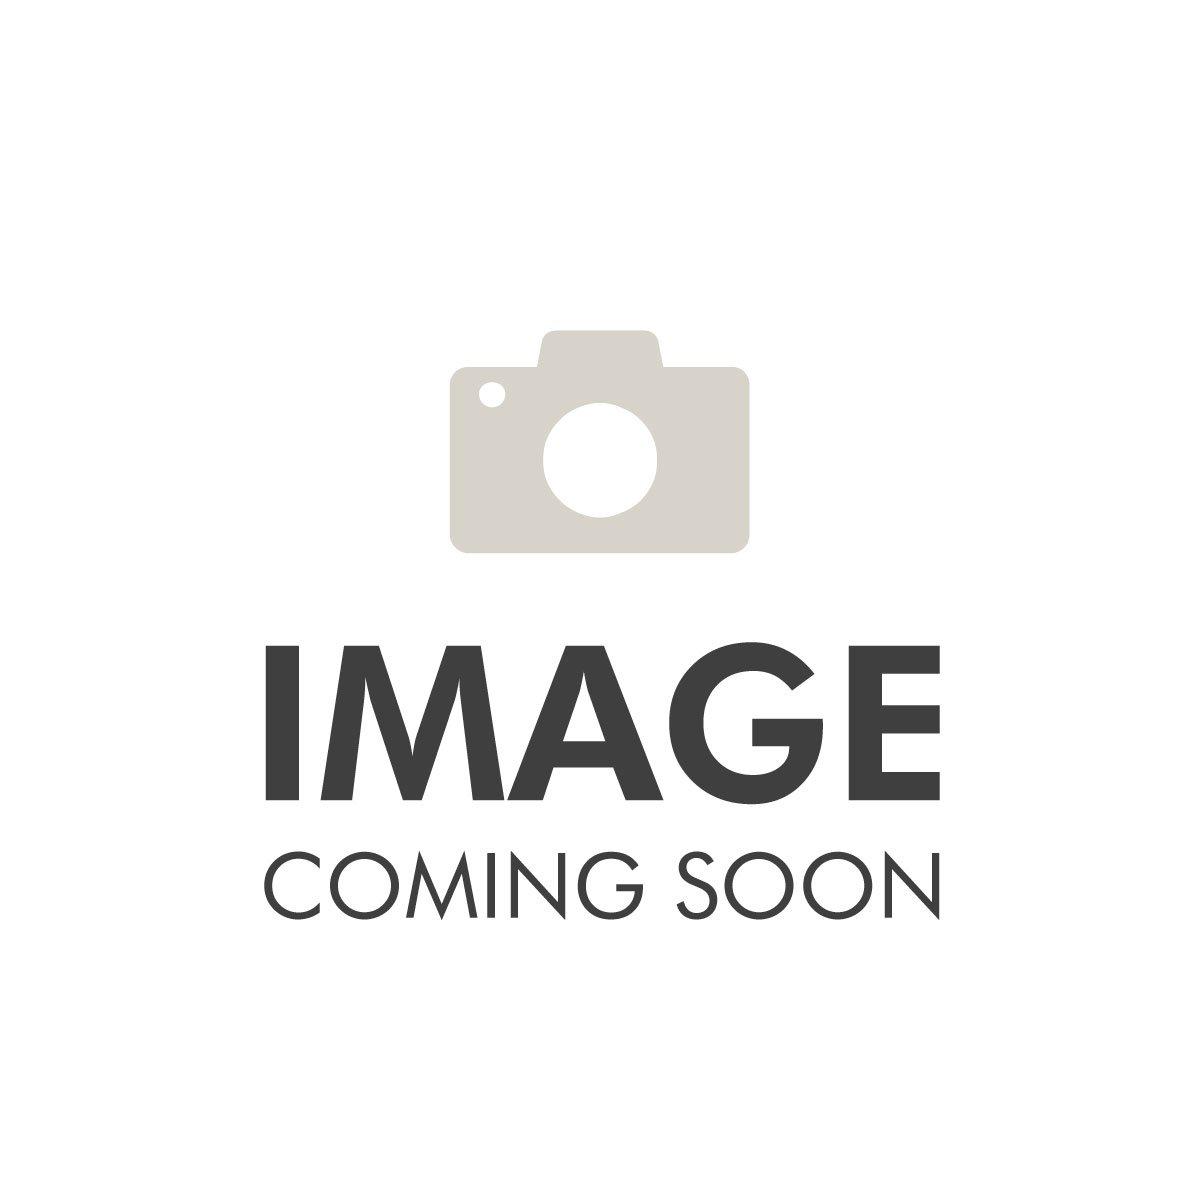 Clarins Extra-Firming Neck Anti-Wrinkle Rejuvenating Cream 50ml